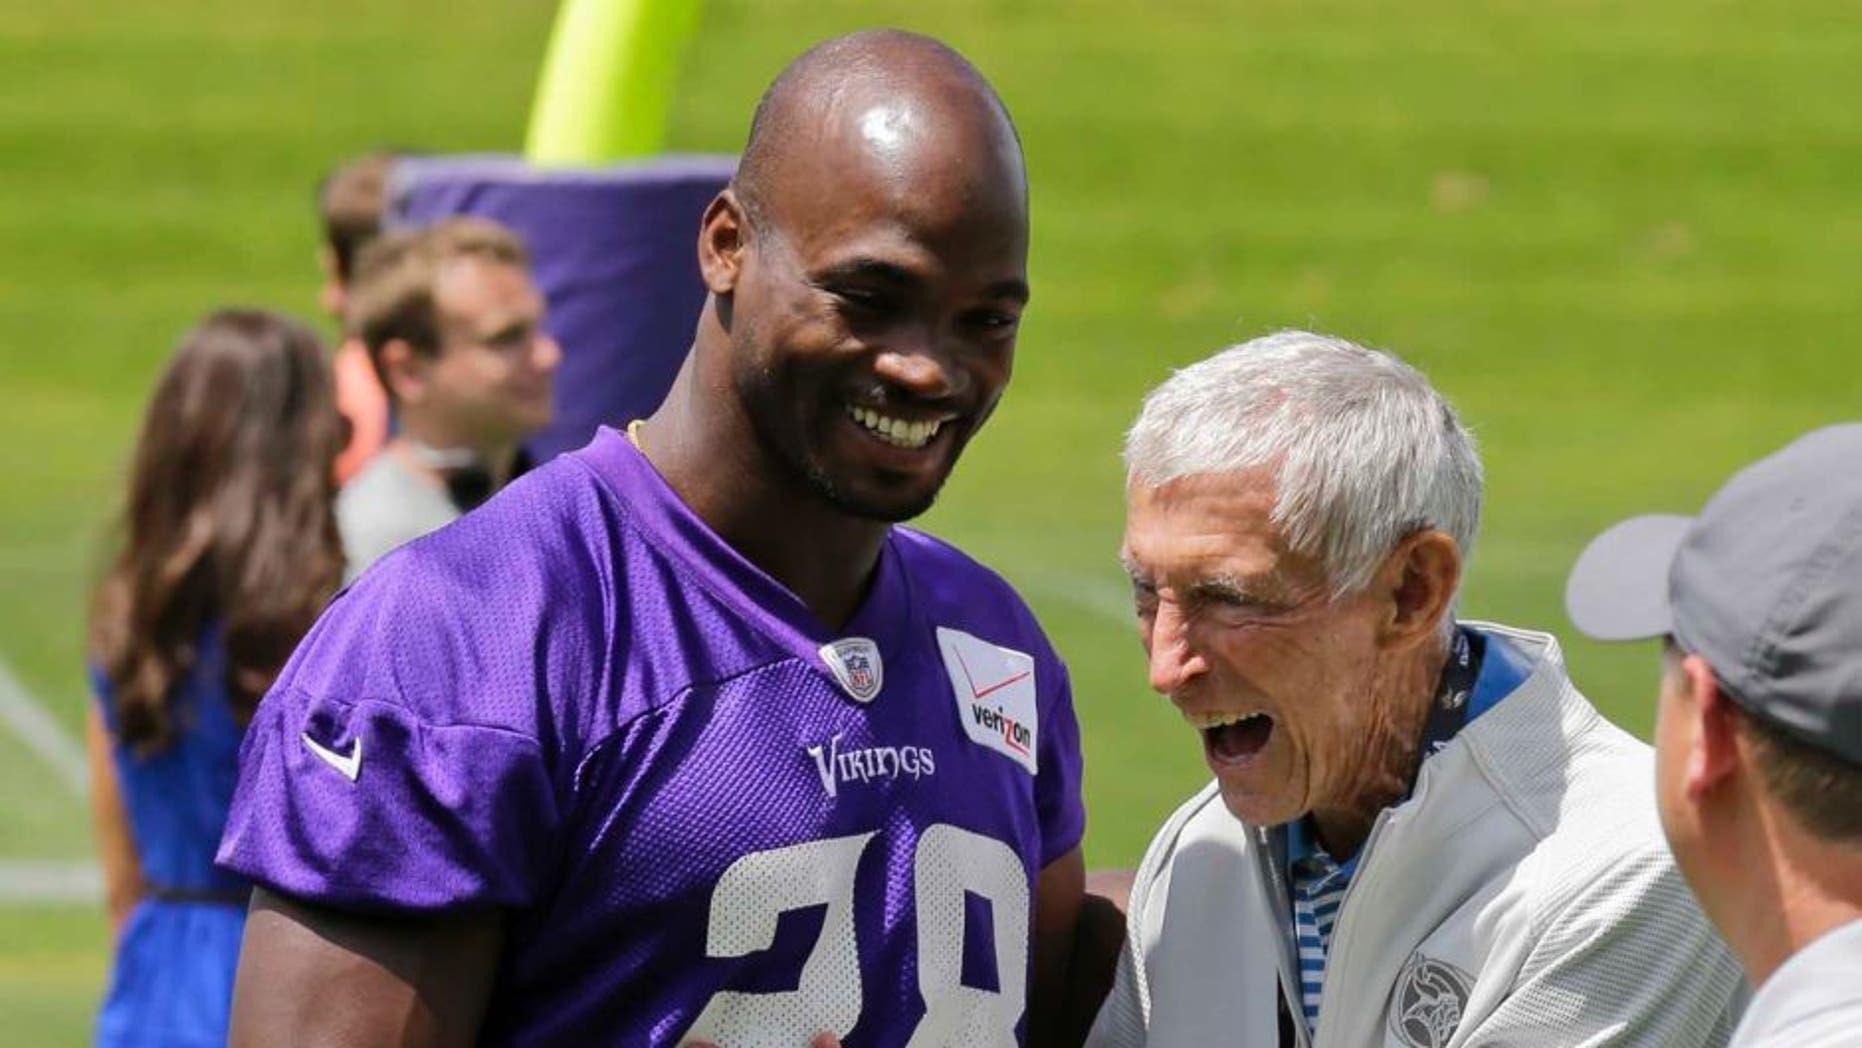 Thursday, June 18: Minnesota Vikings running back Adrian Peterson (left) laughs with former Vikings head coach Jerry Burns during minicamp in Eden Prairie, Minn.